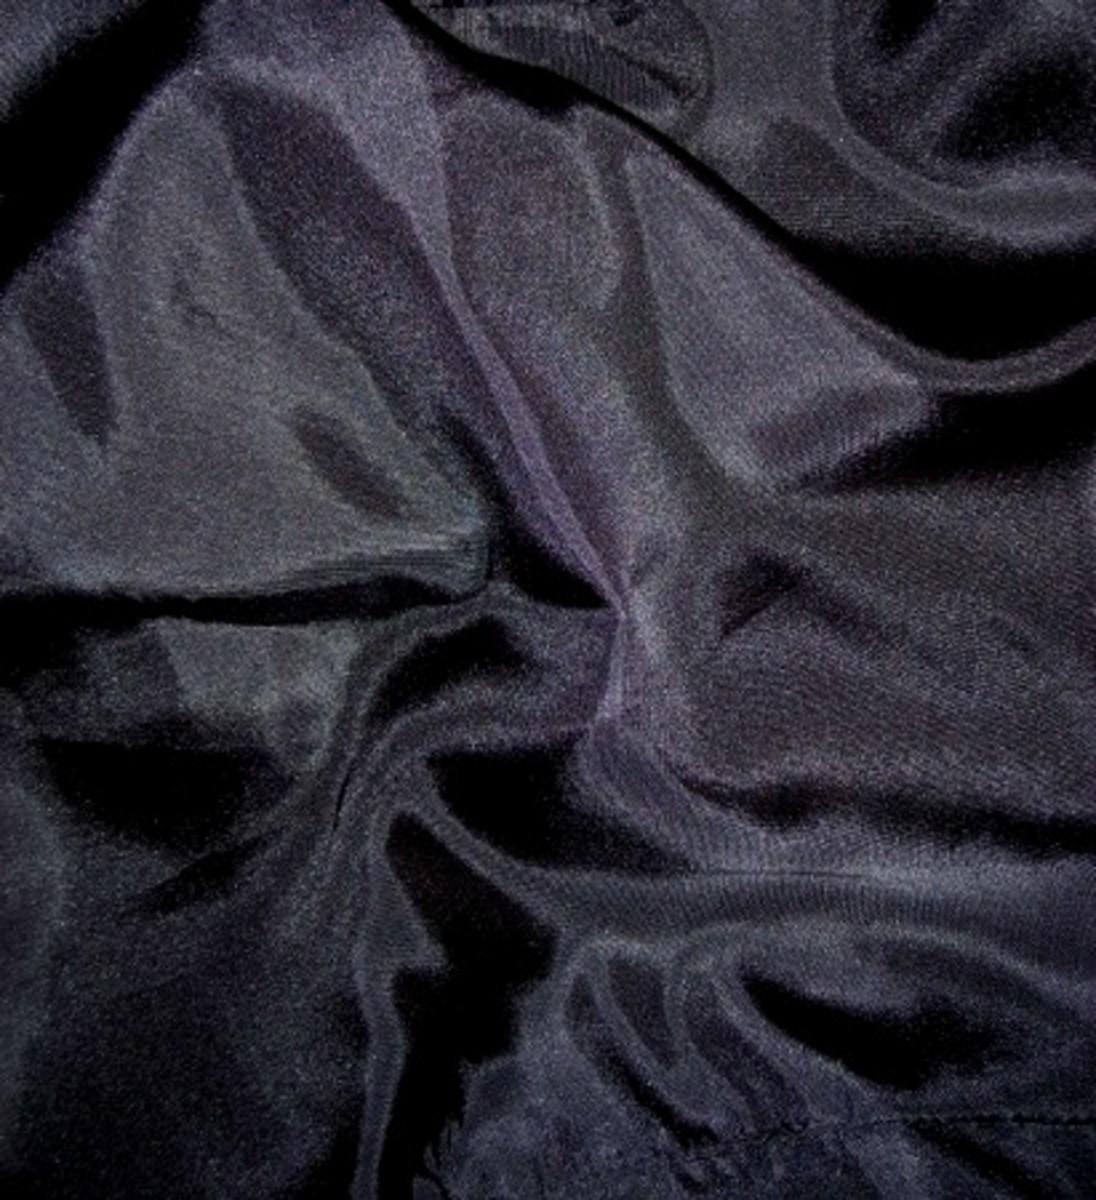 Black satin fabric